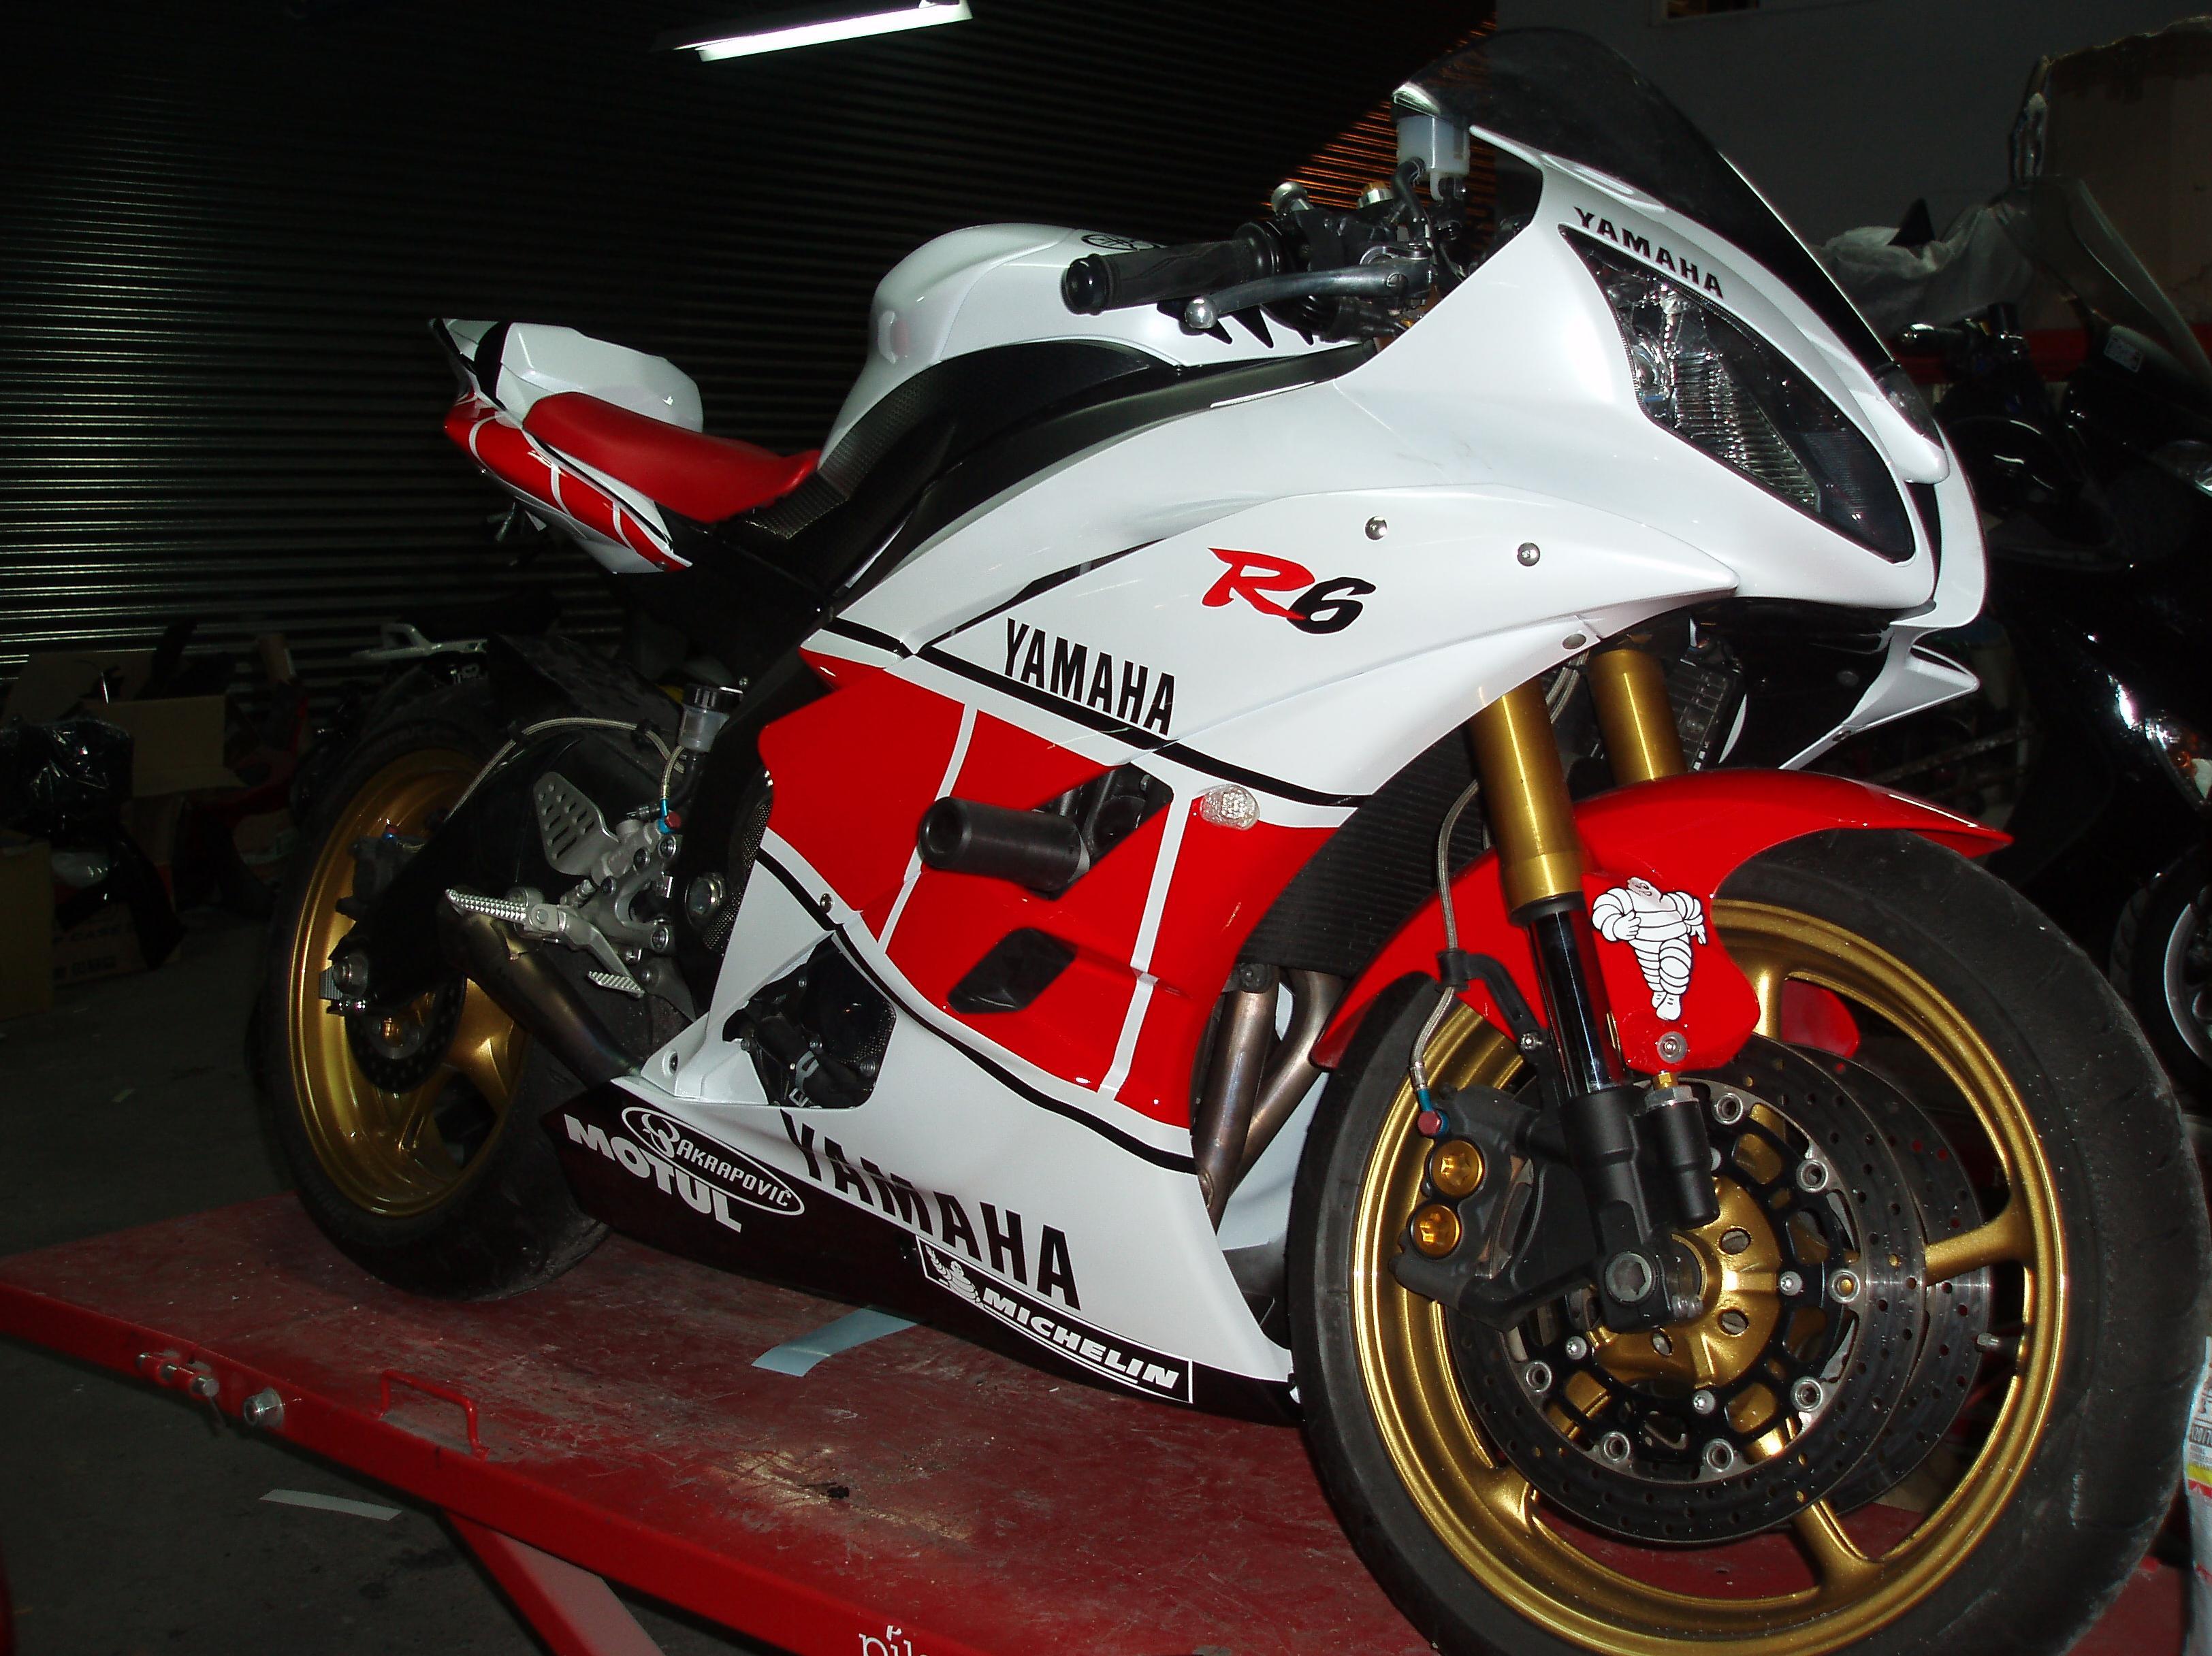 Foto 30 de Motos en Vigo | Moto 2